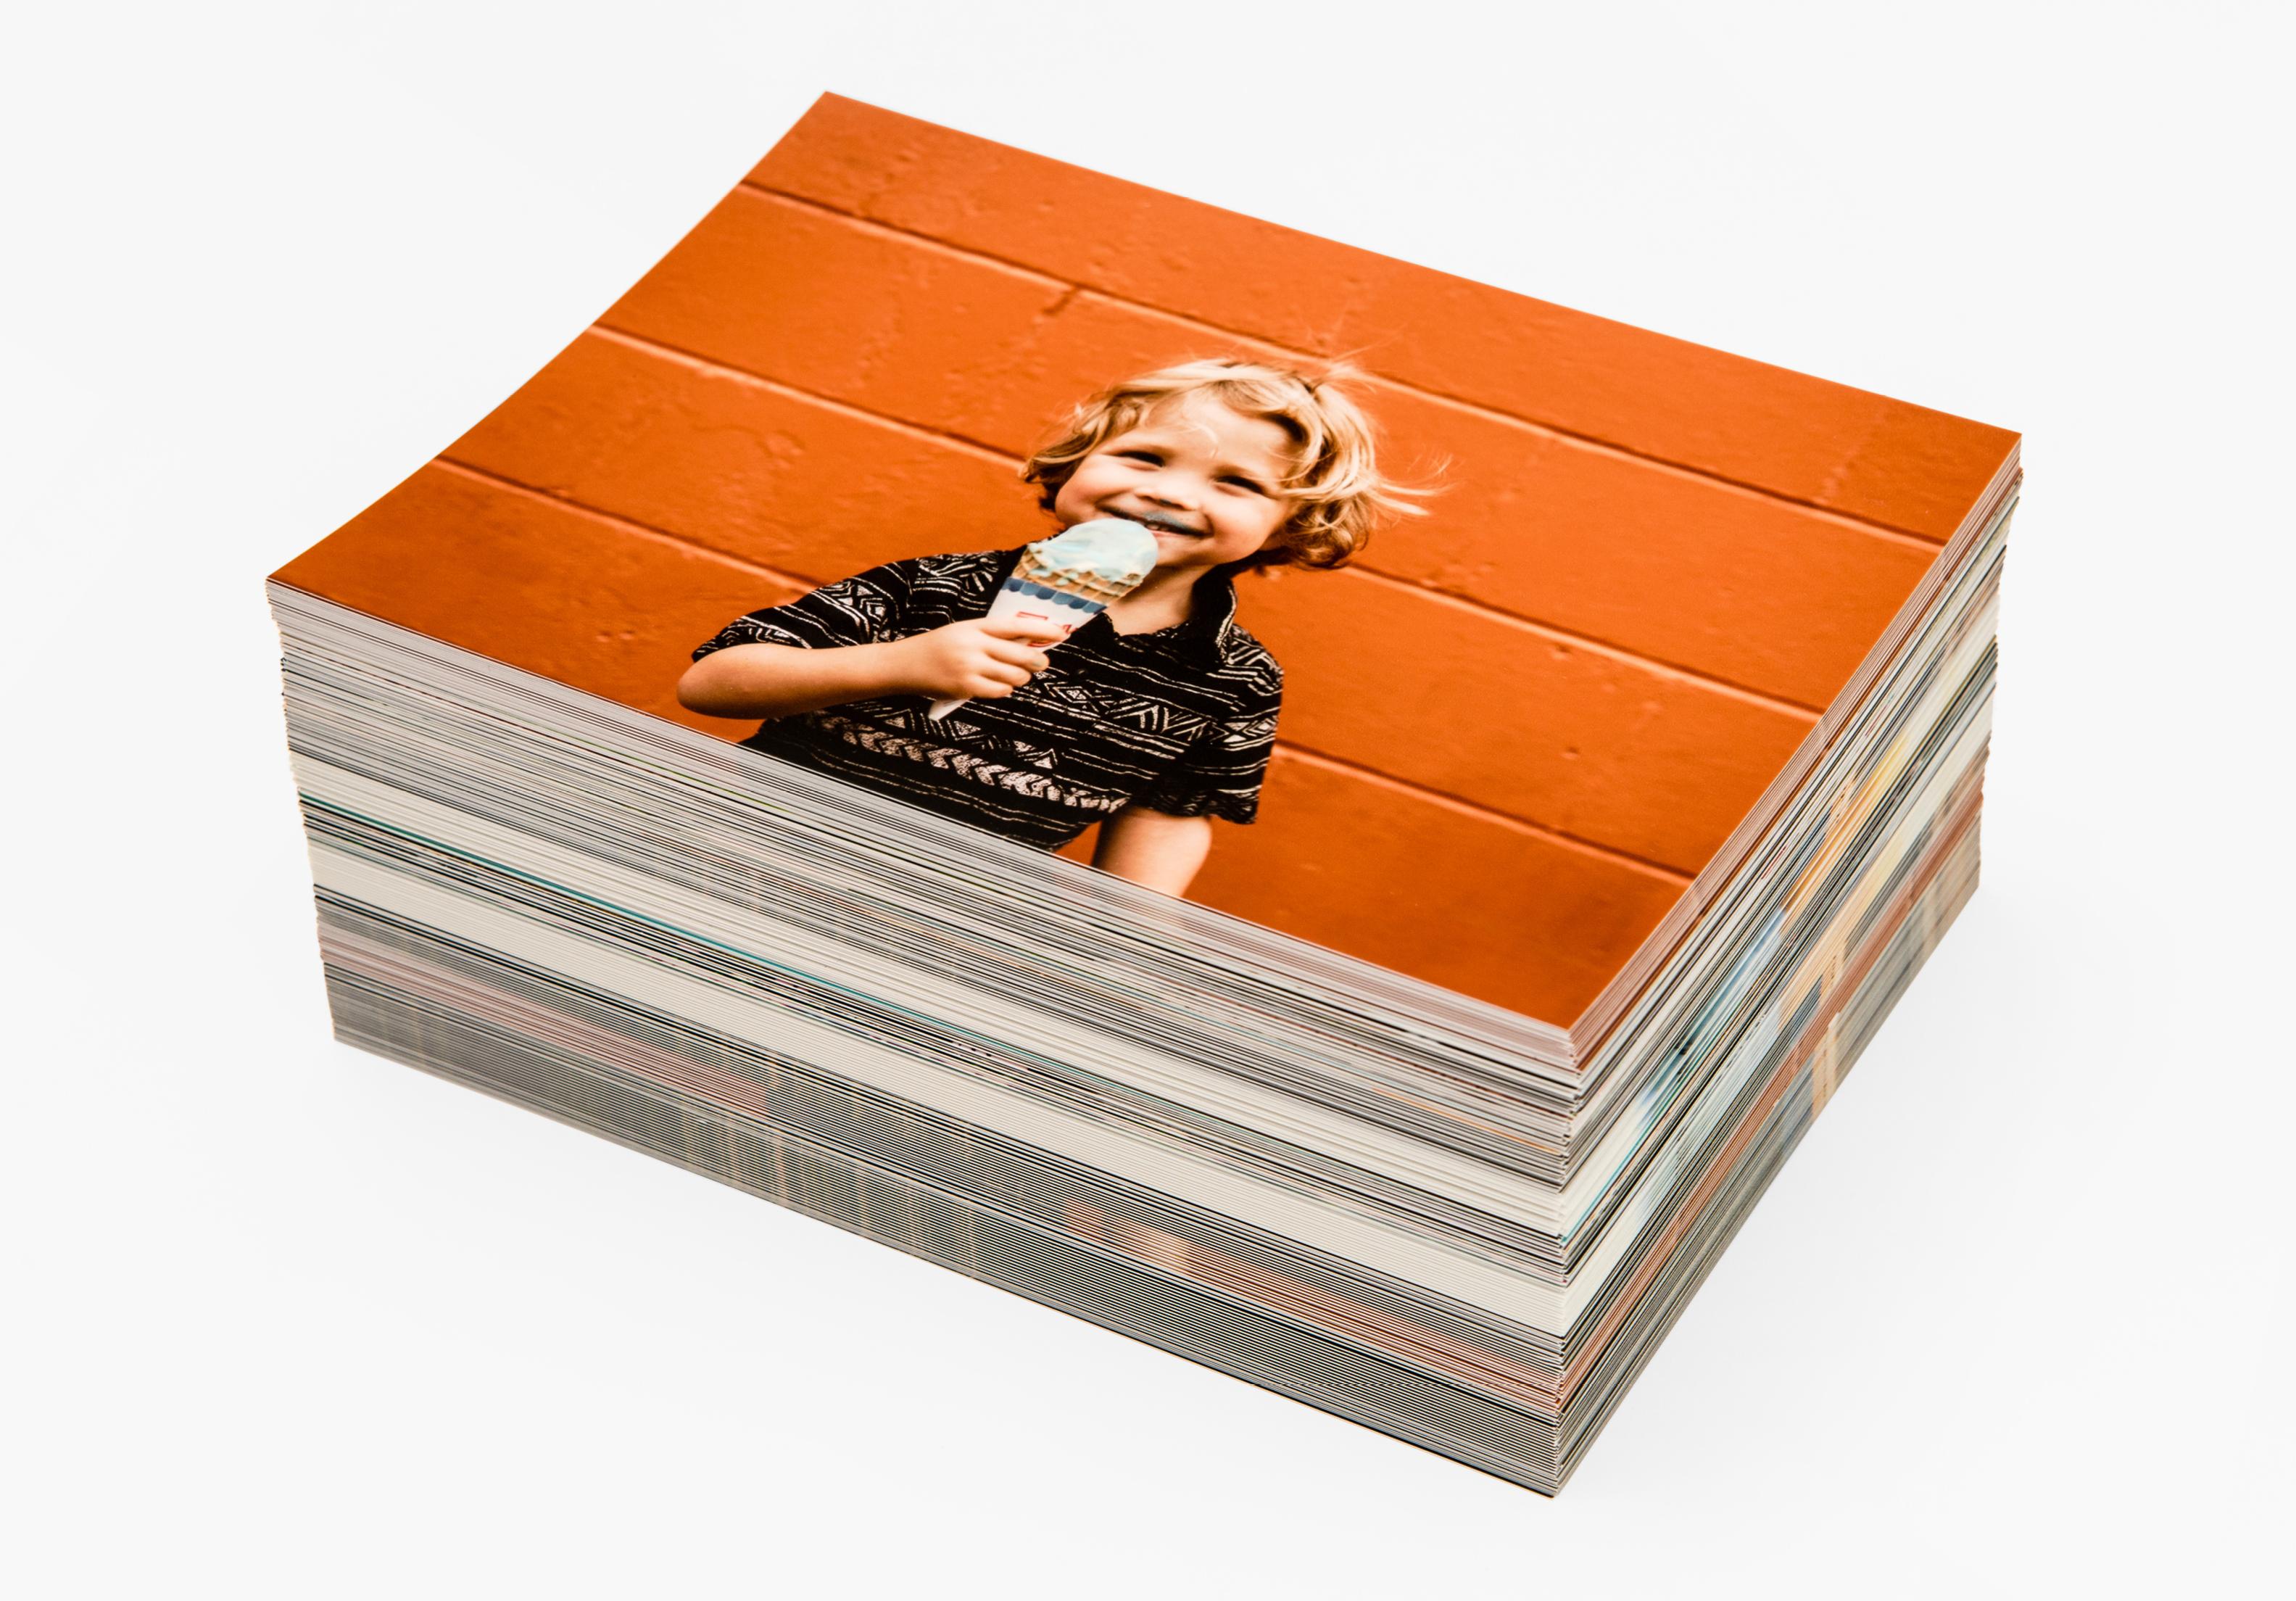 Bulk Priced Prints Volume Pricing Nations Photo Lab